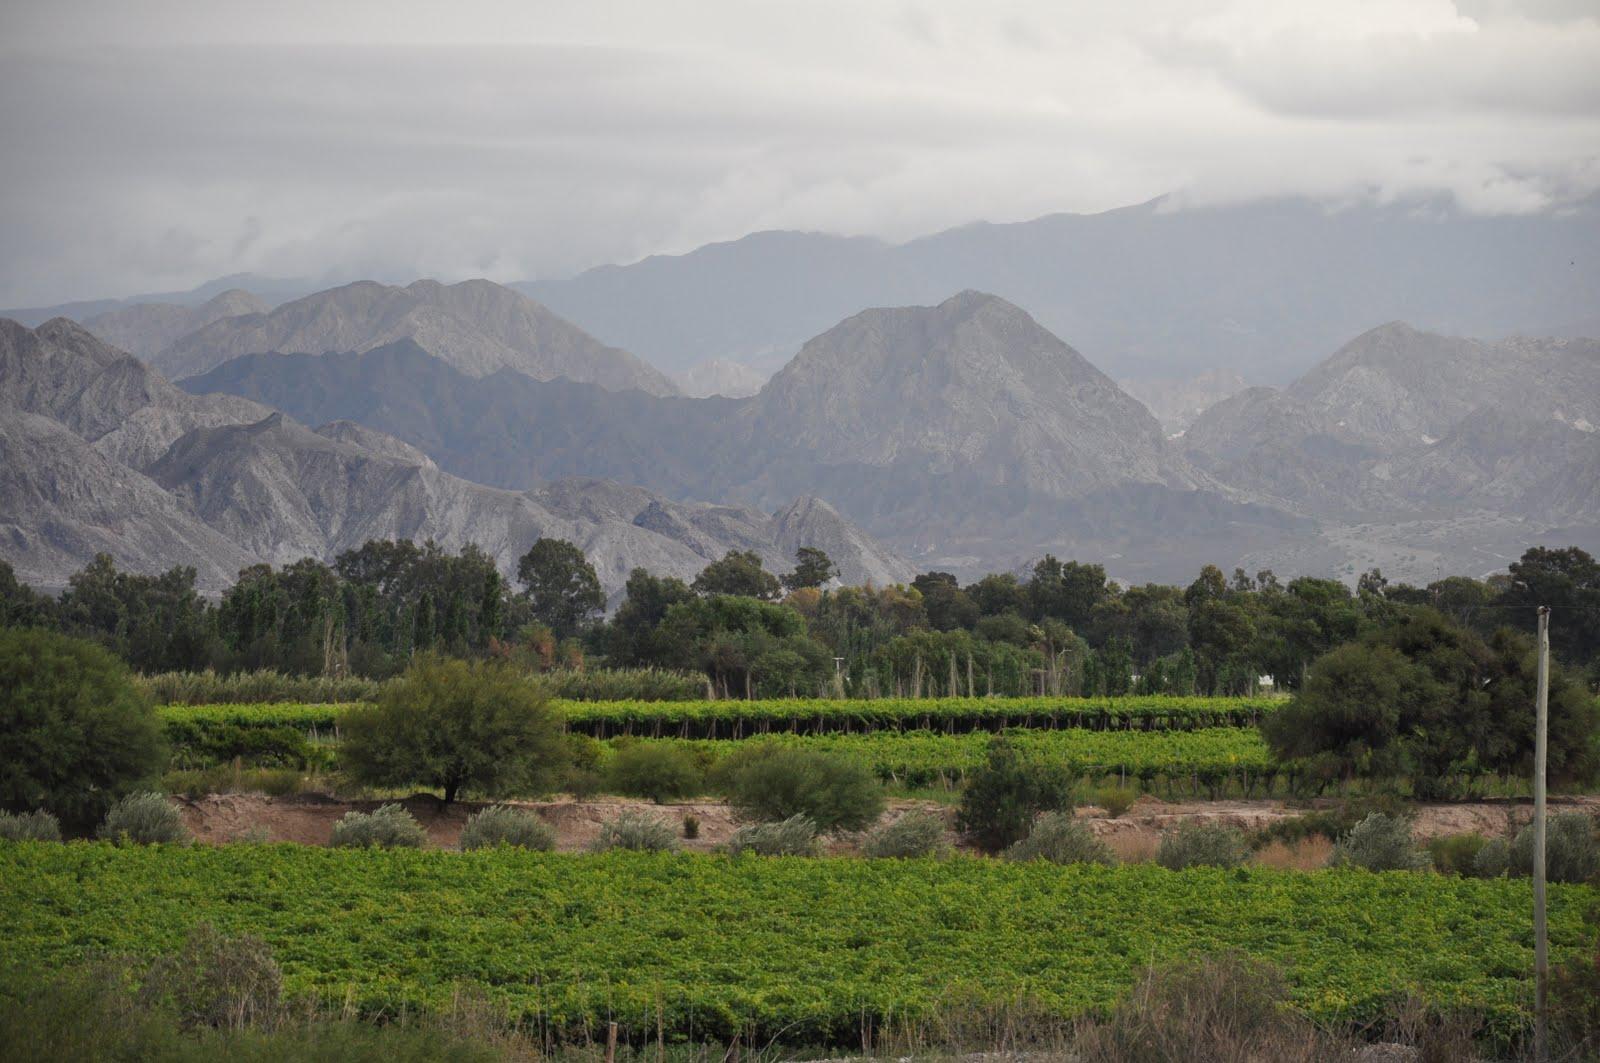 Circuito Zonda San Juan : Mis fotos vista del cerro blanco zonda san juan argentina